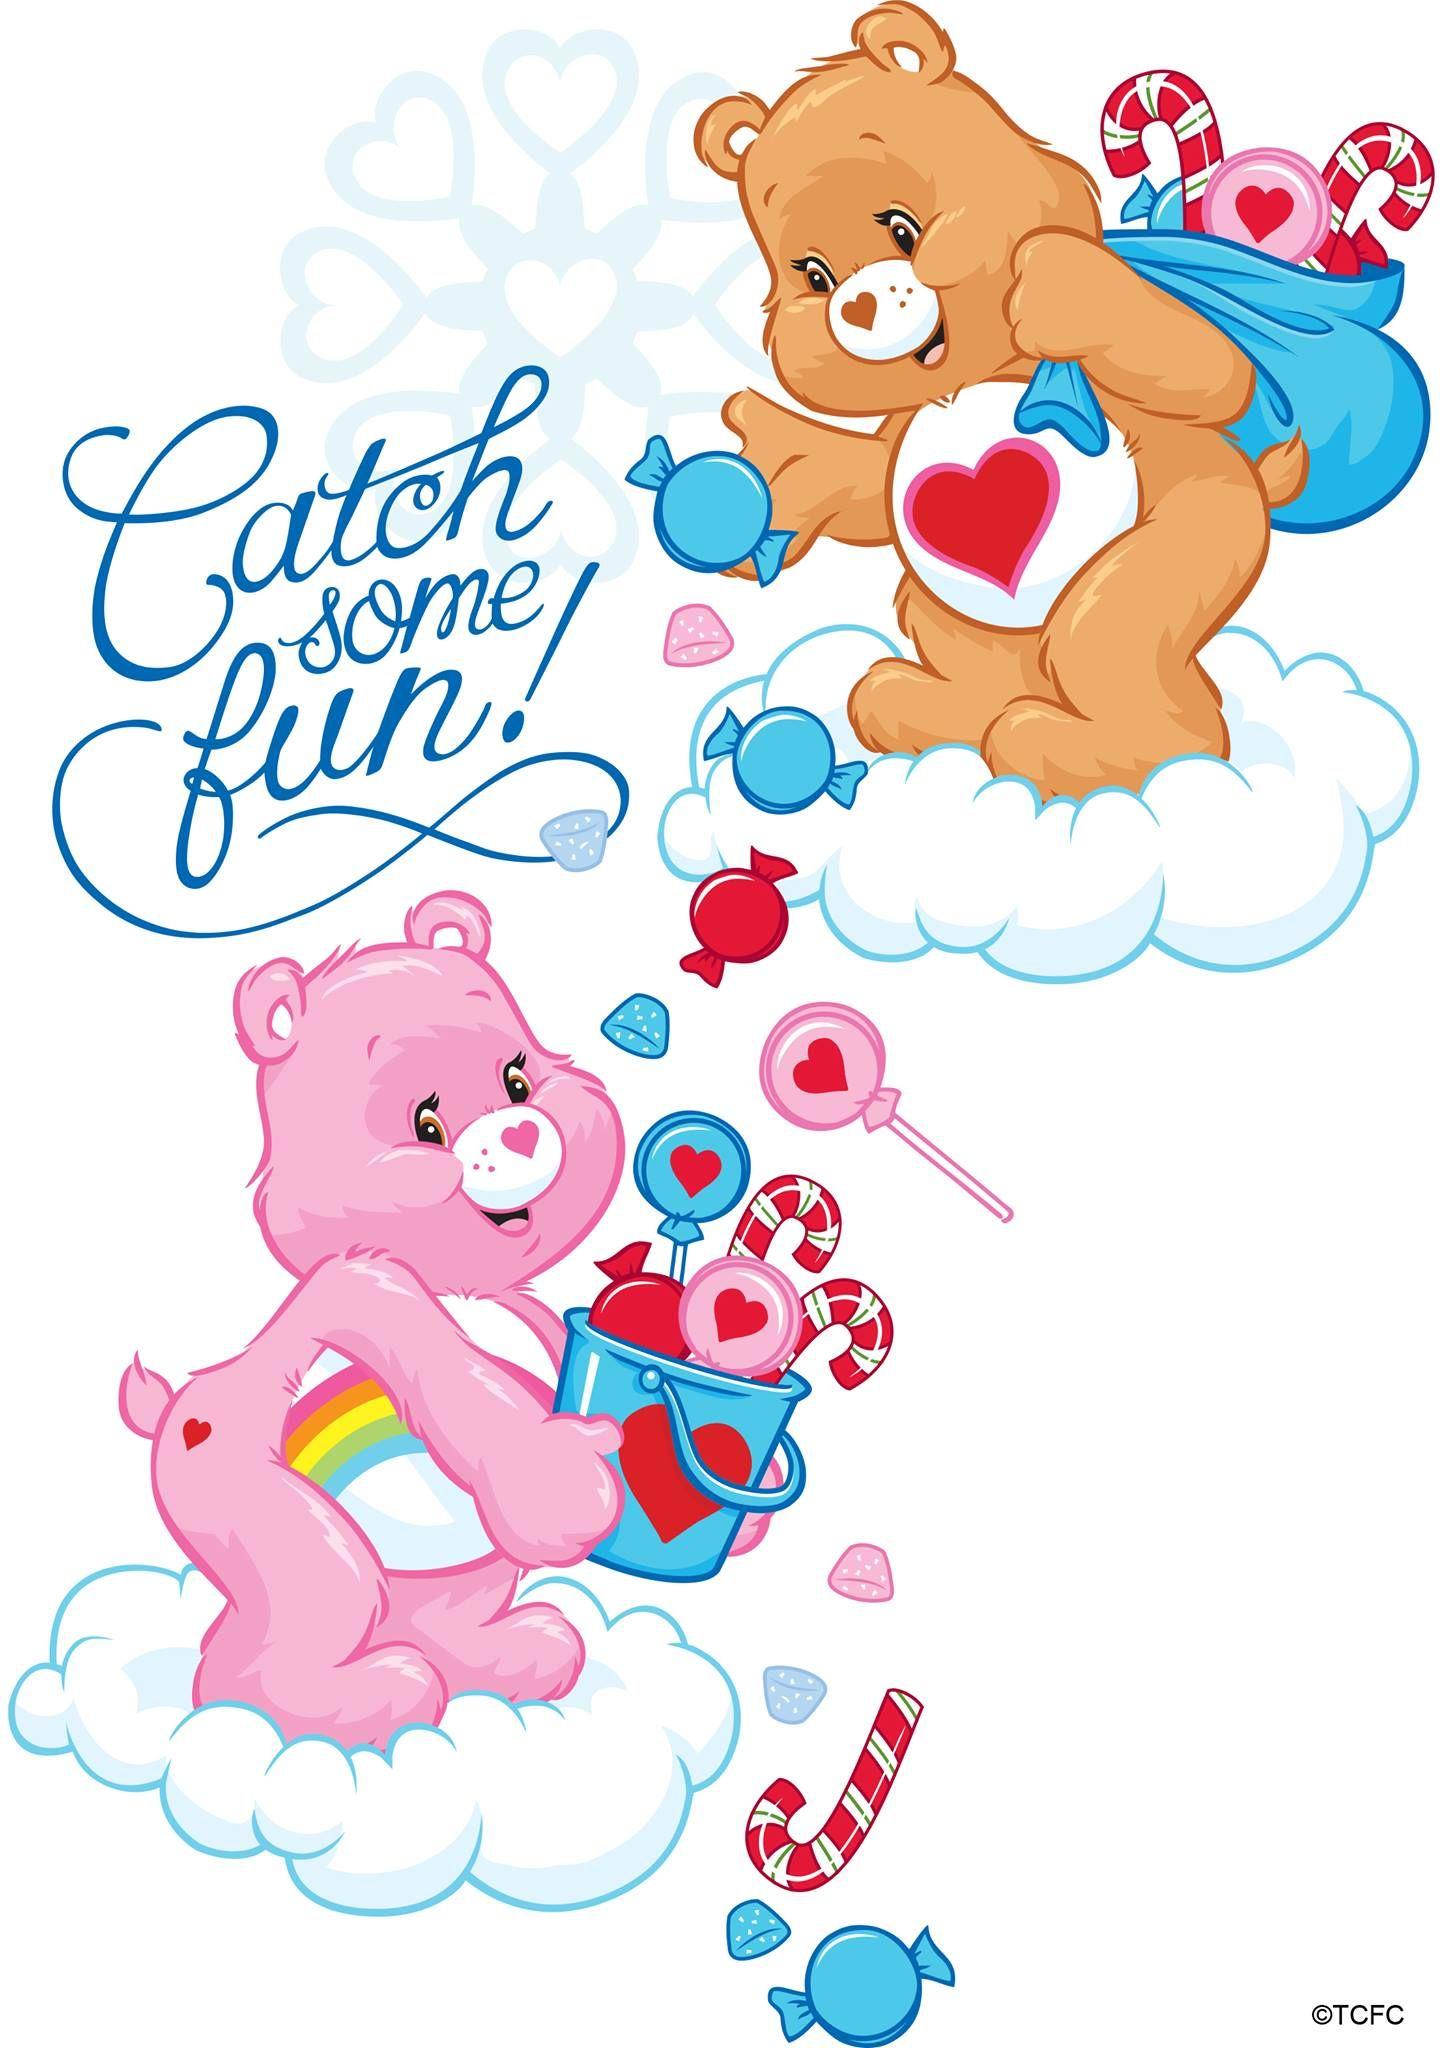 Care bears tenderheart and cheer bear catch some fun